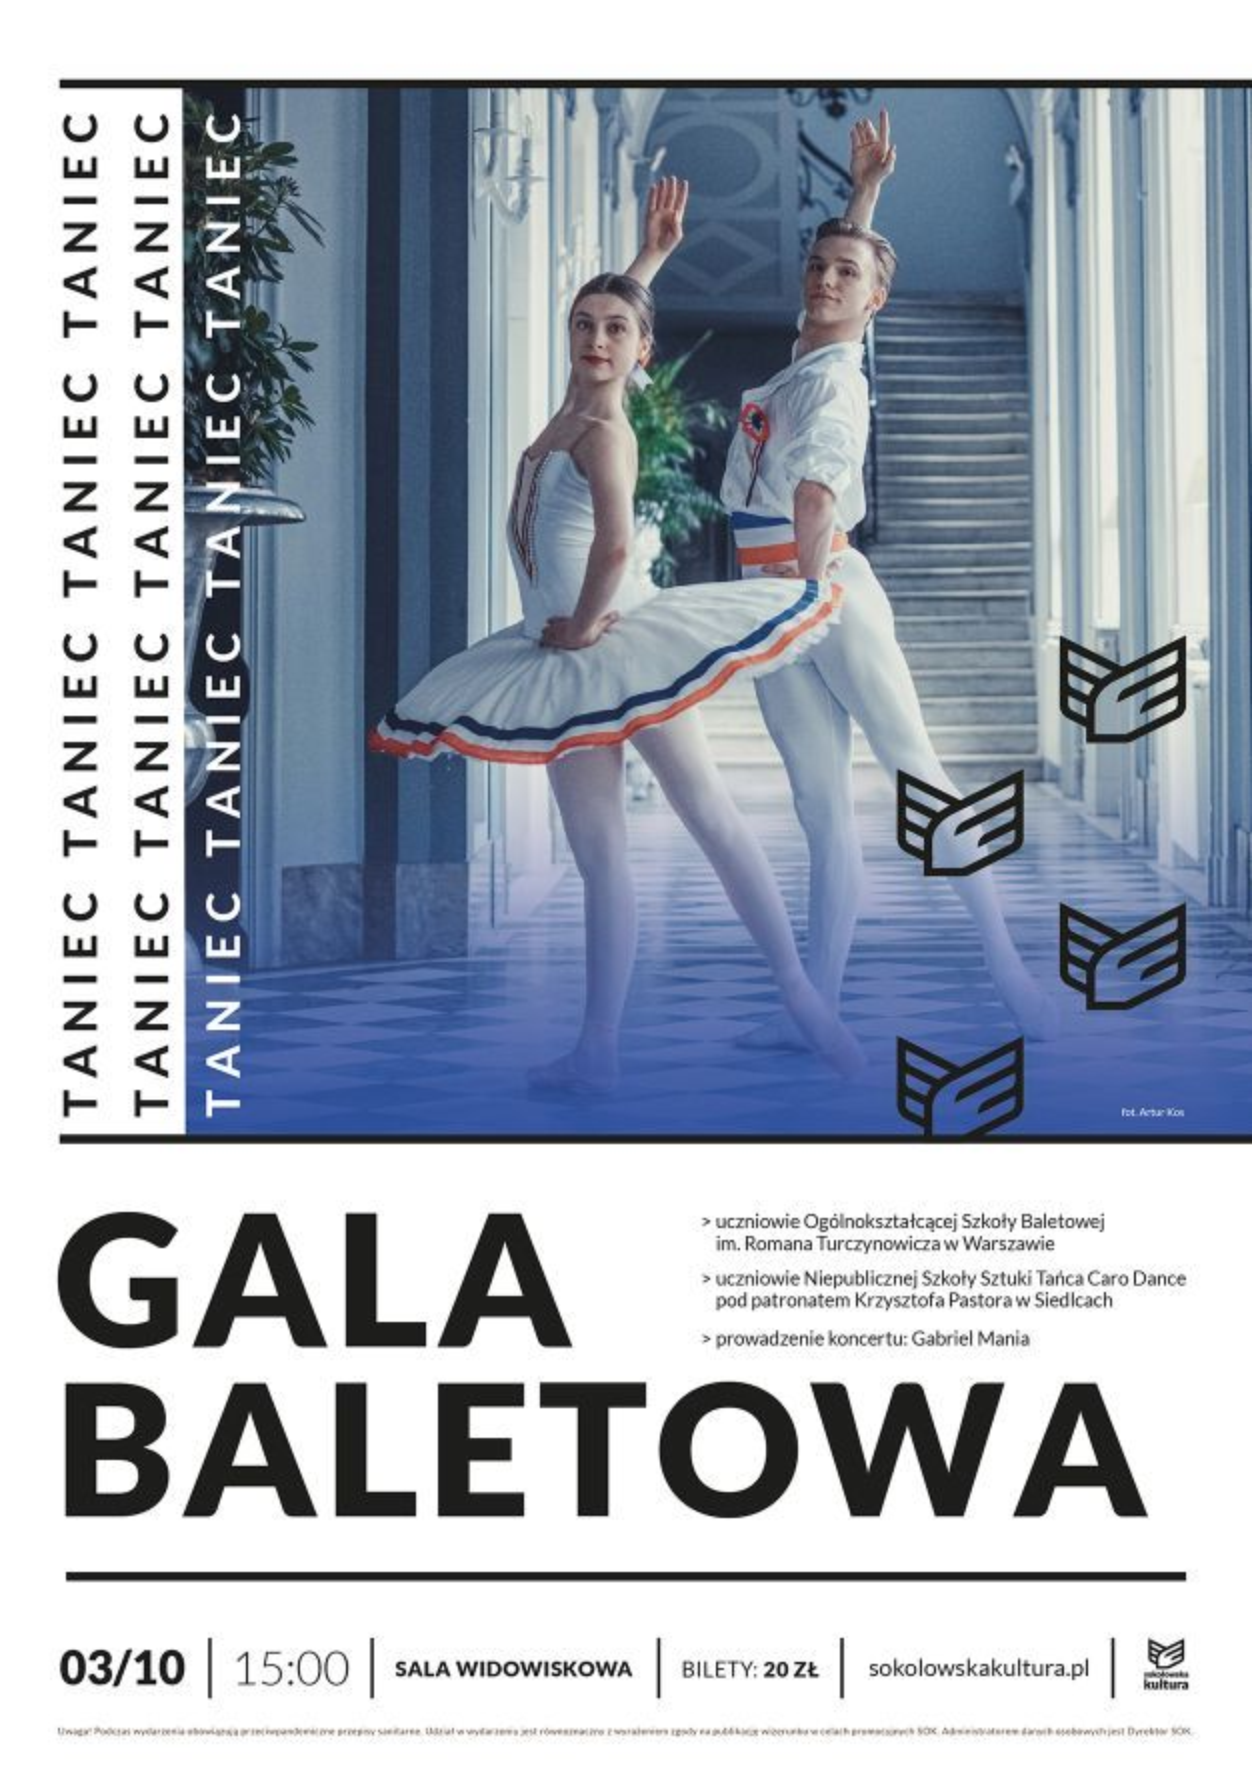 foto:  - gala baletowa